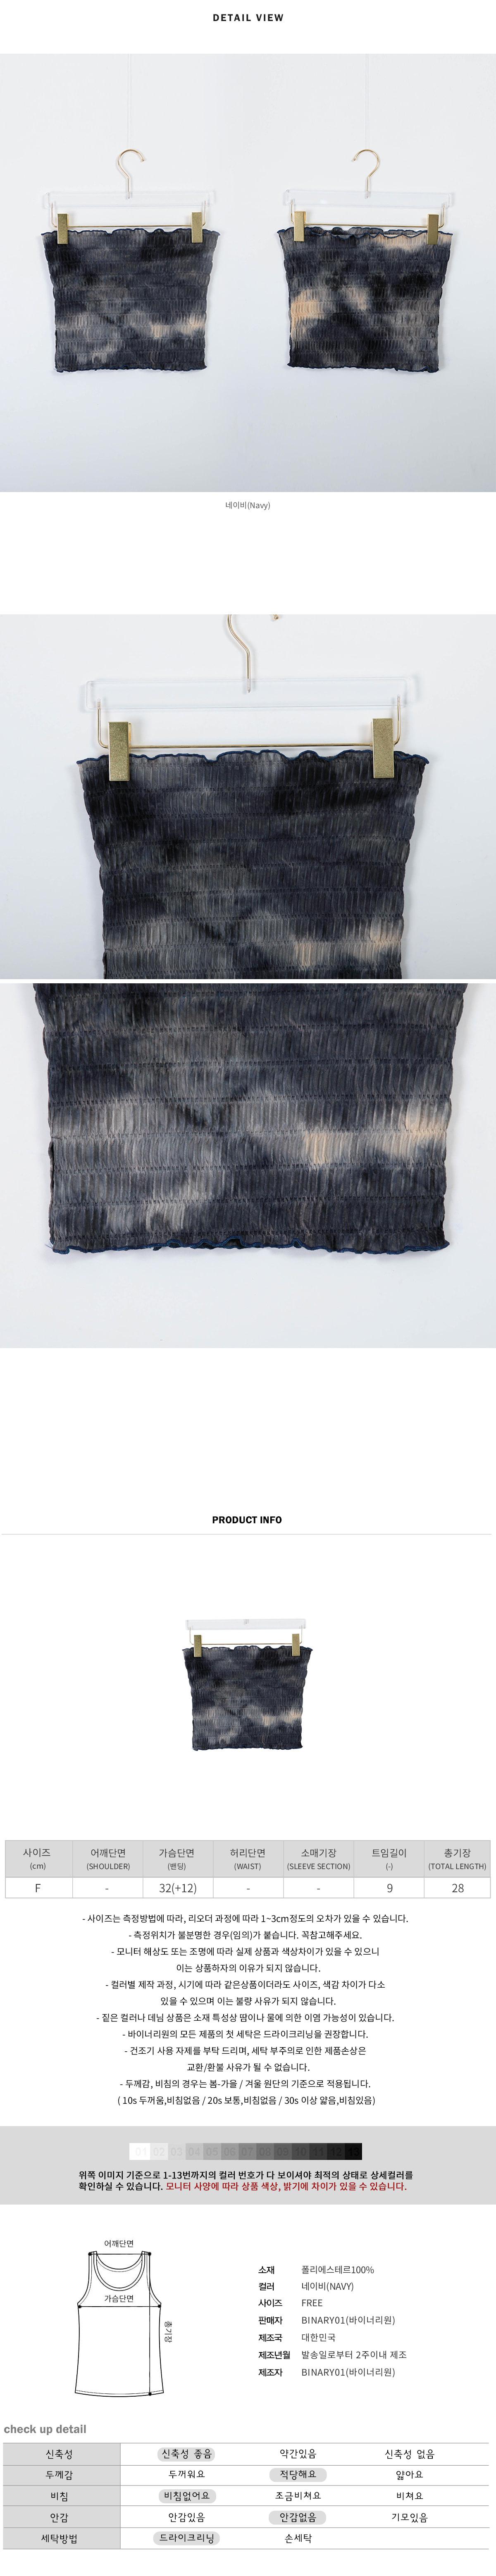 Tie-dye smoke layered top